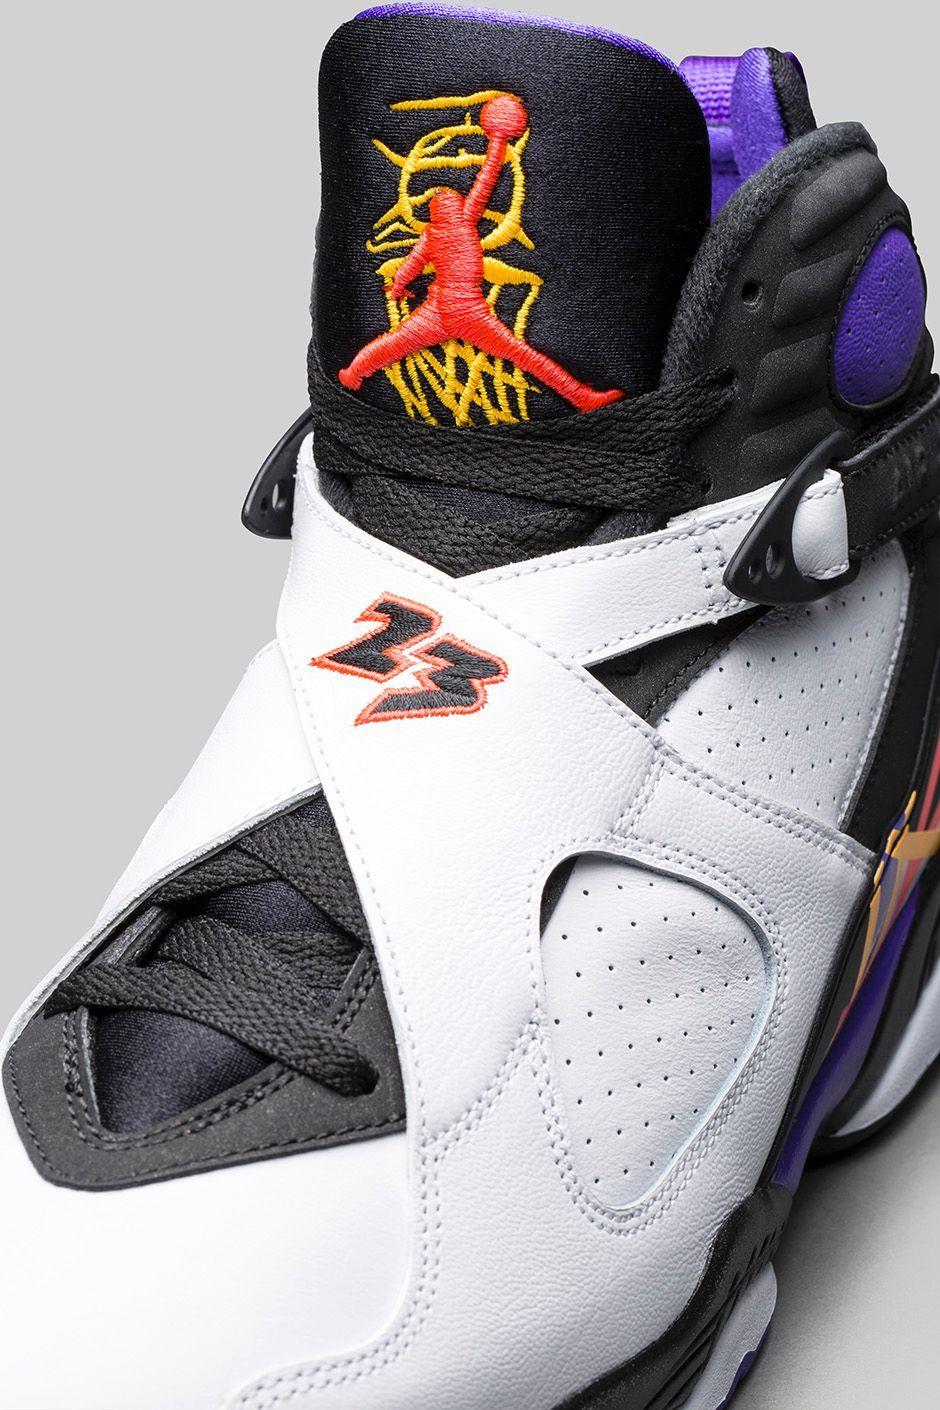 timeless design 9d721 8934c  DROOOOOOOOOOOOOL  Nike Air Jordan 8 Retro